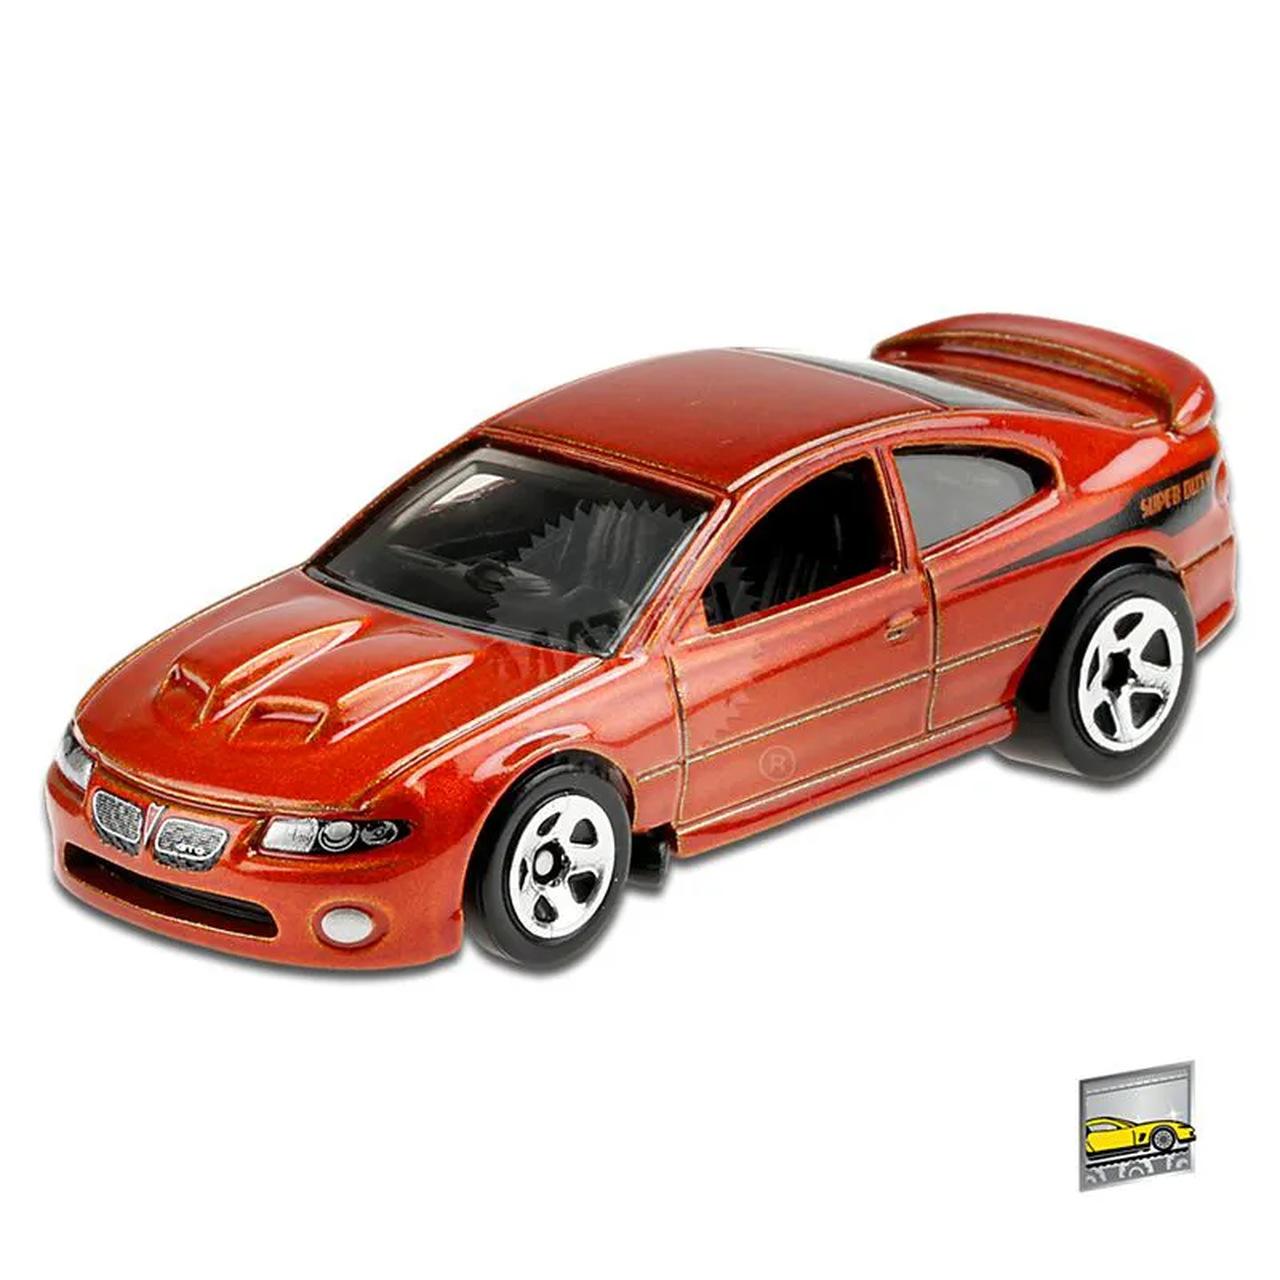 Carrinho Hot Wheels: '06 Pontiac GTO  Factory Fresh - Mattel